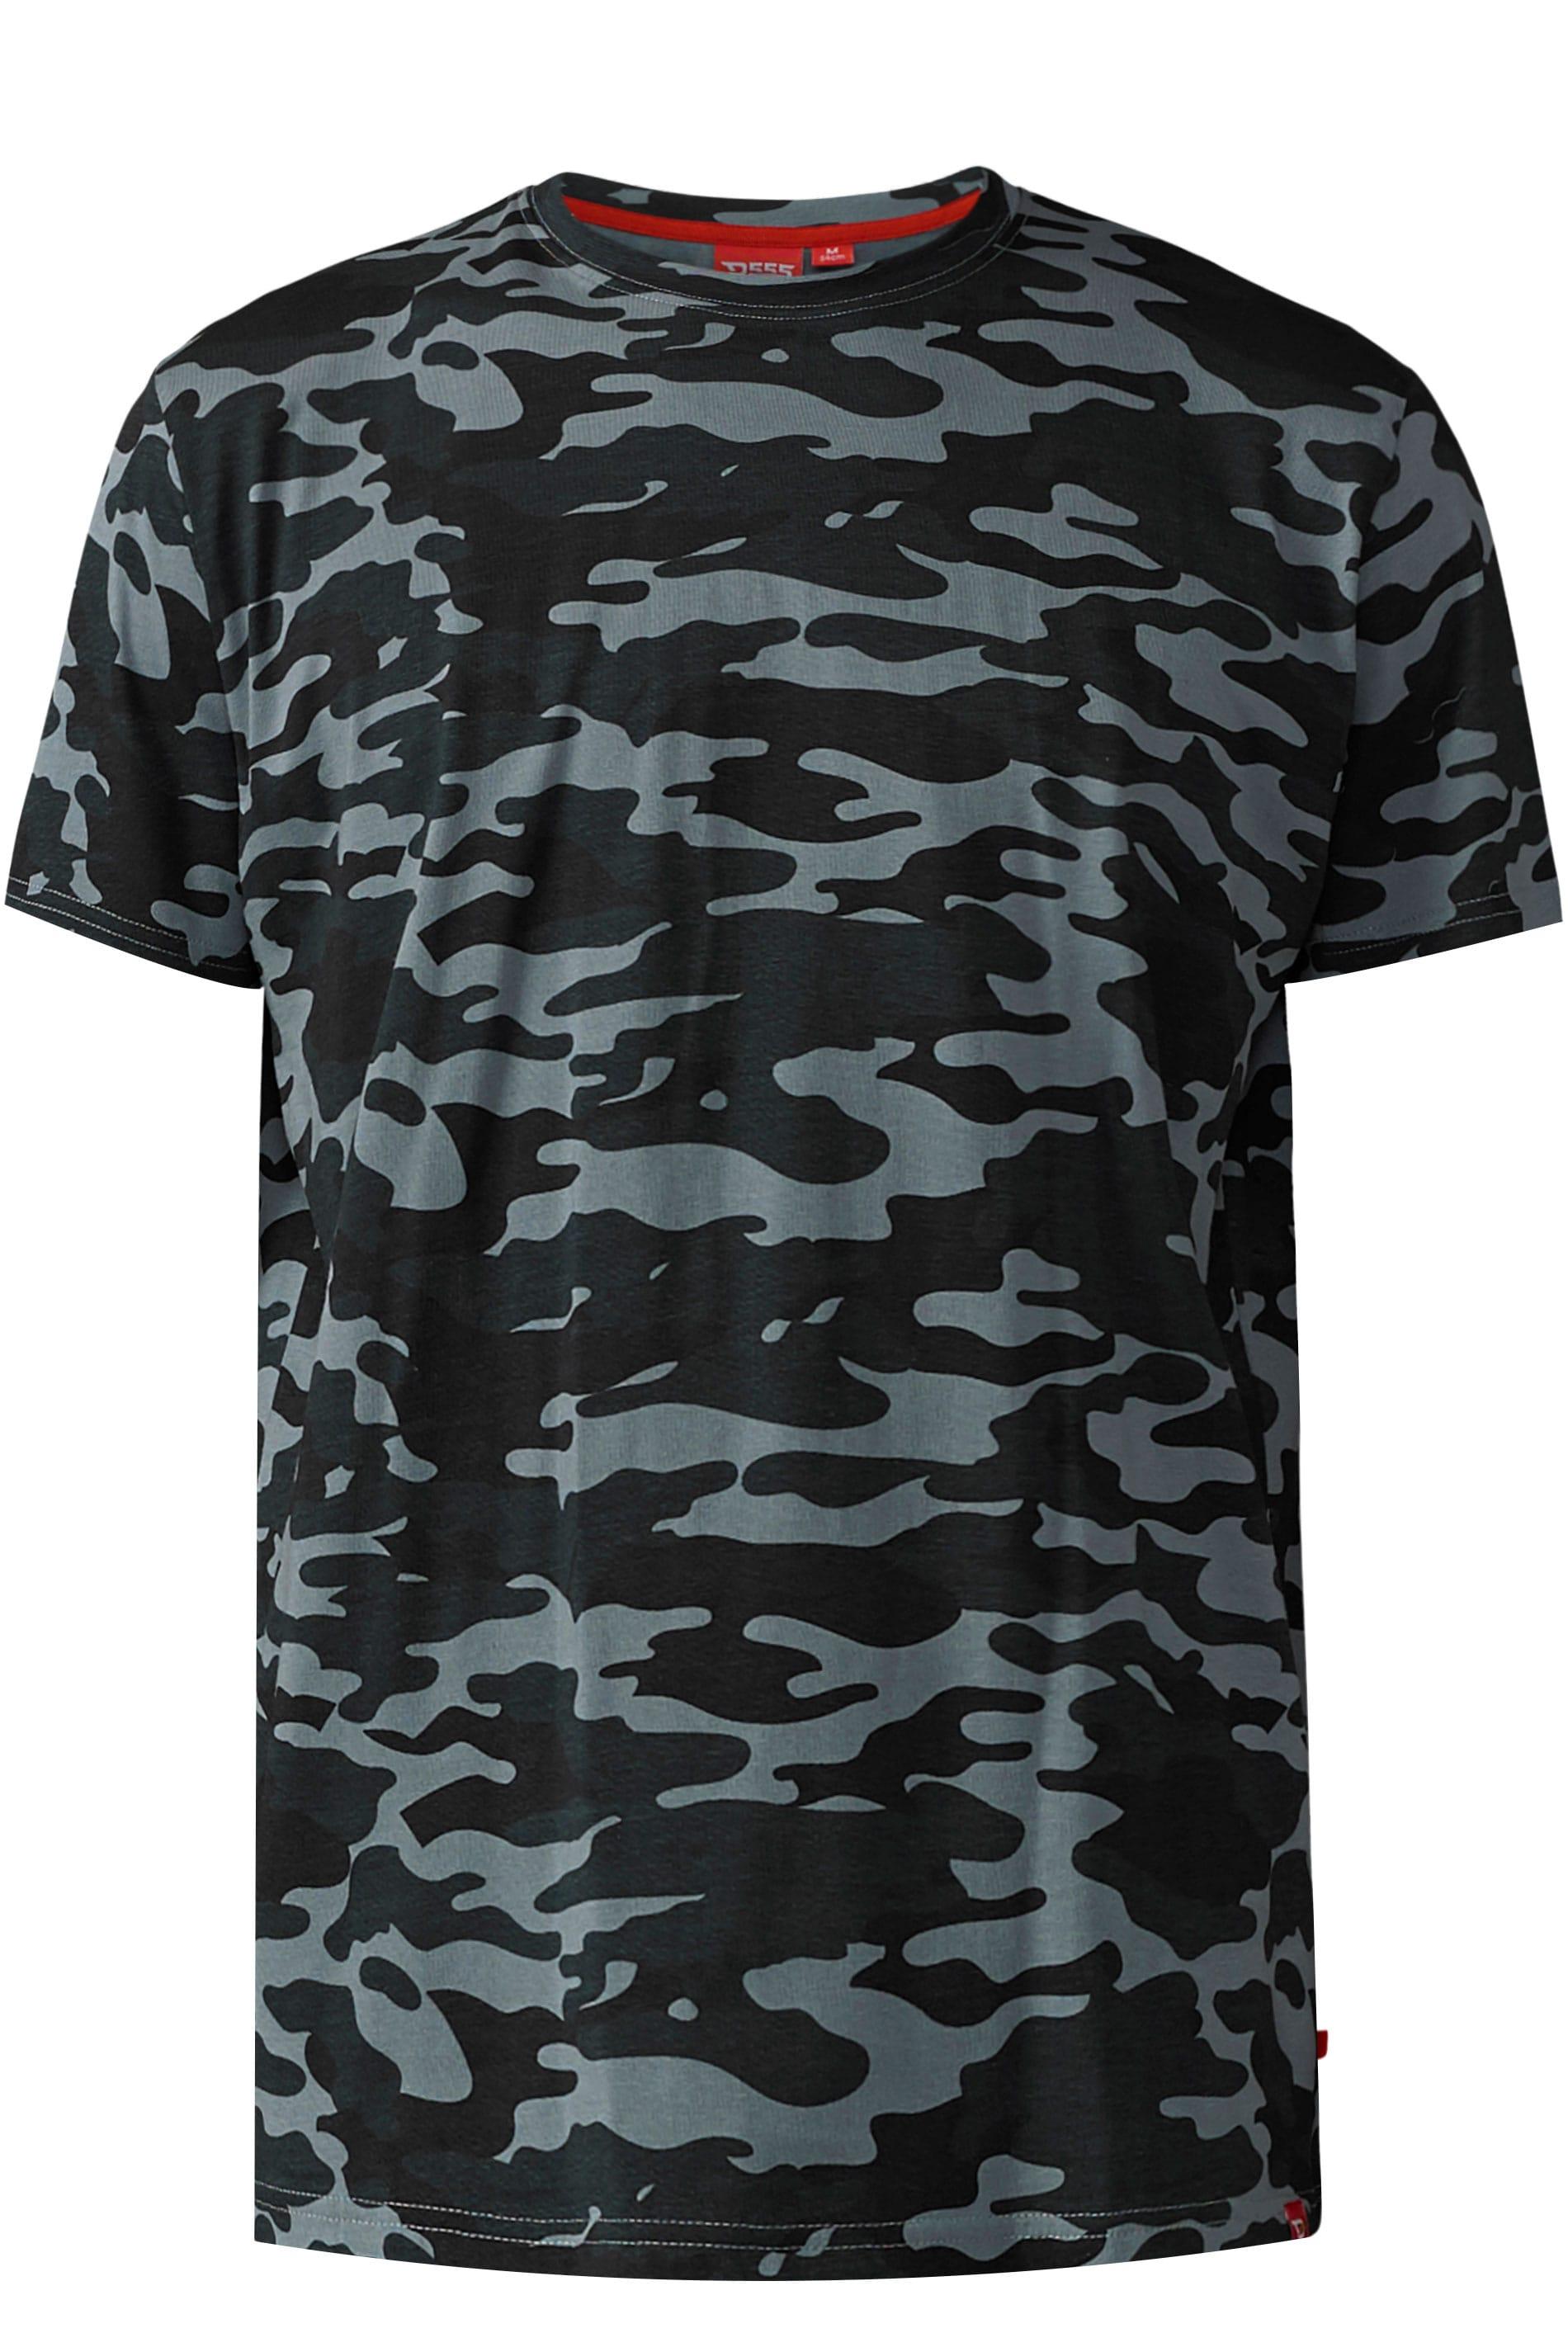 D555 Grey Camouflage T-Shirt_c68c.jpg